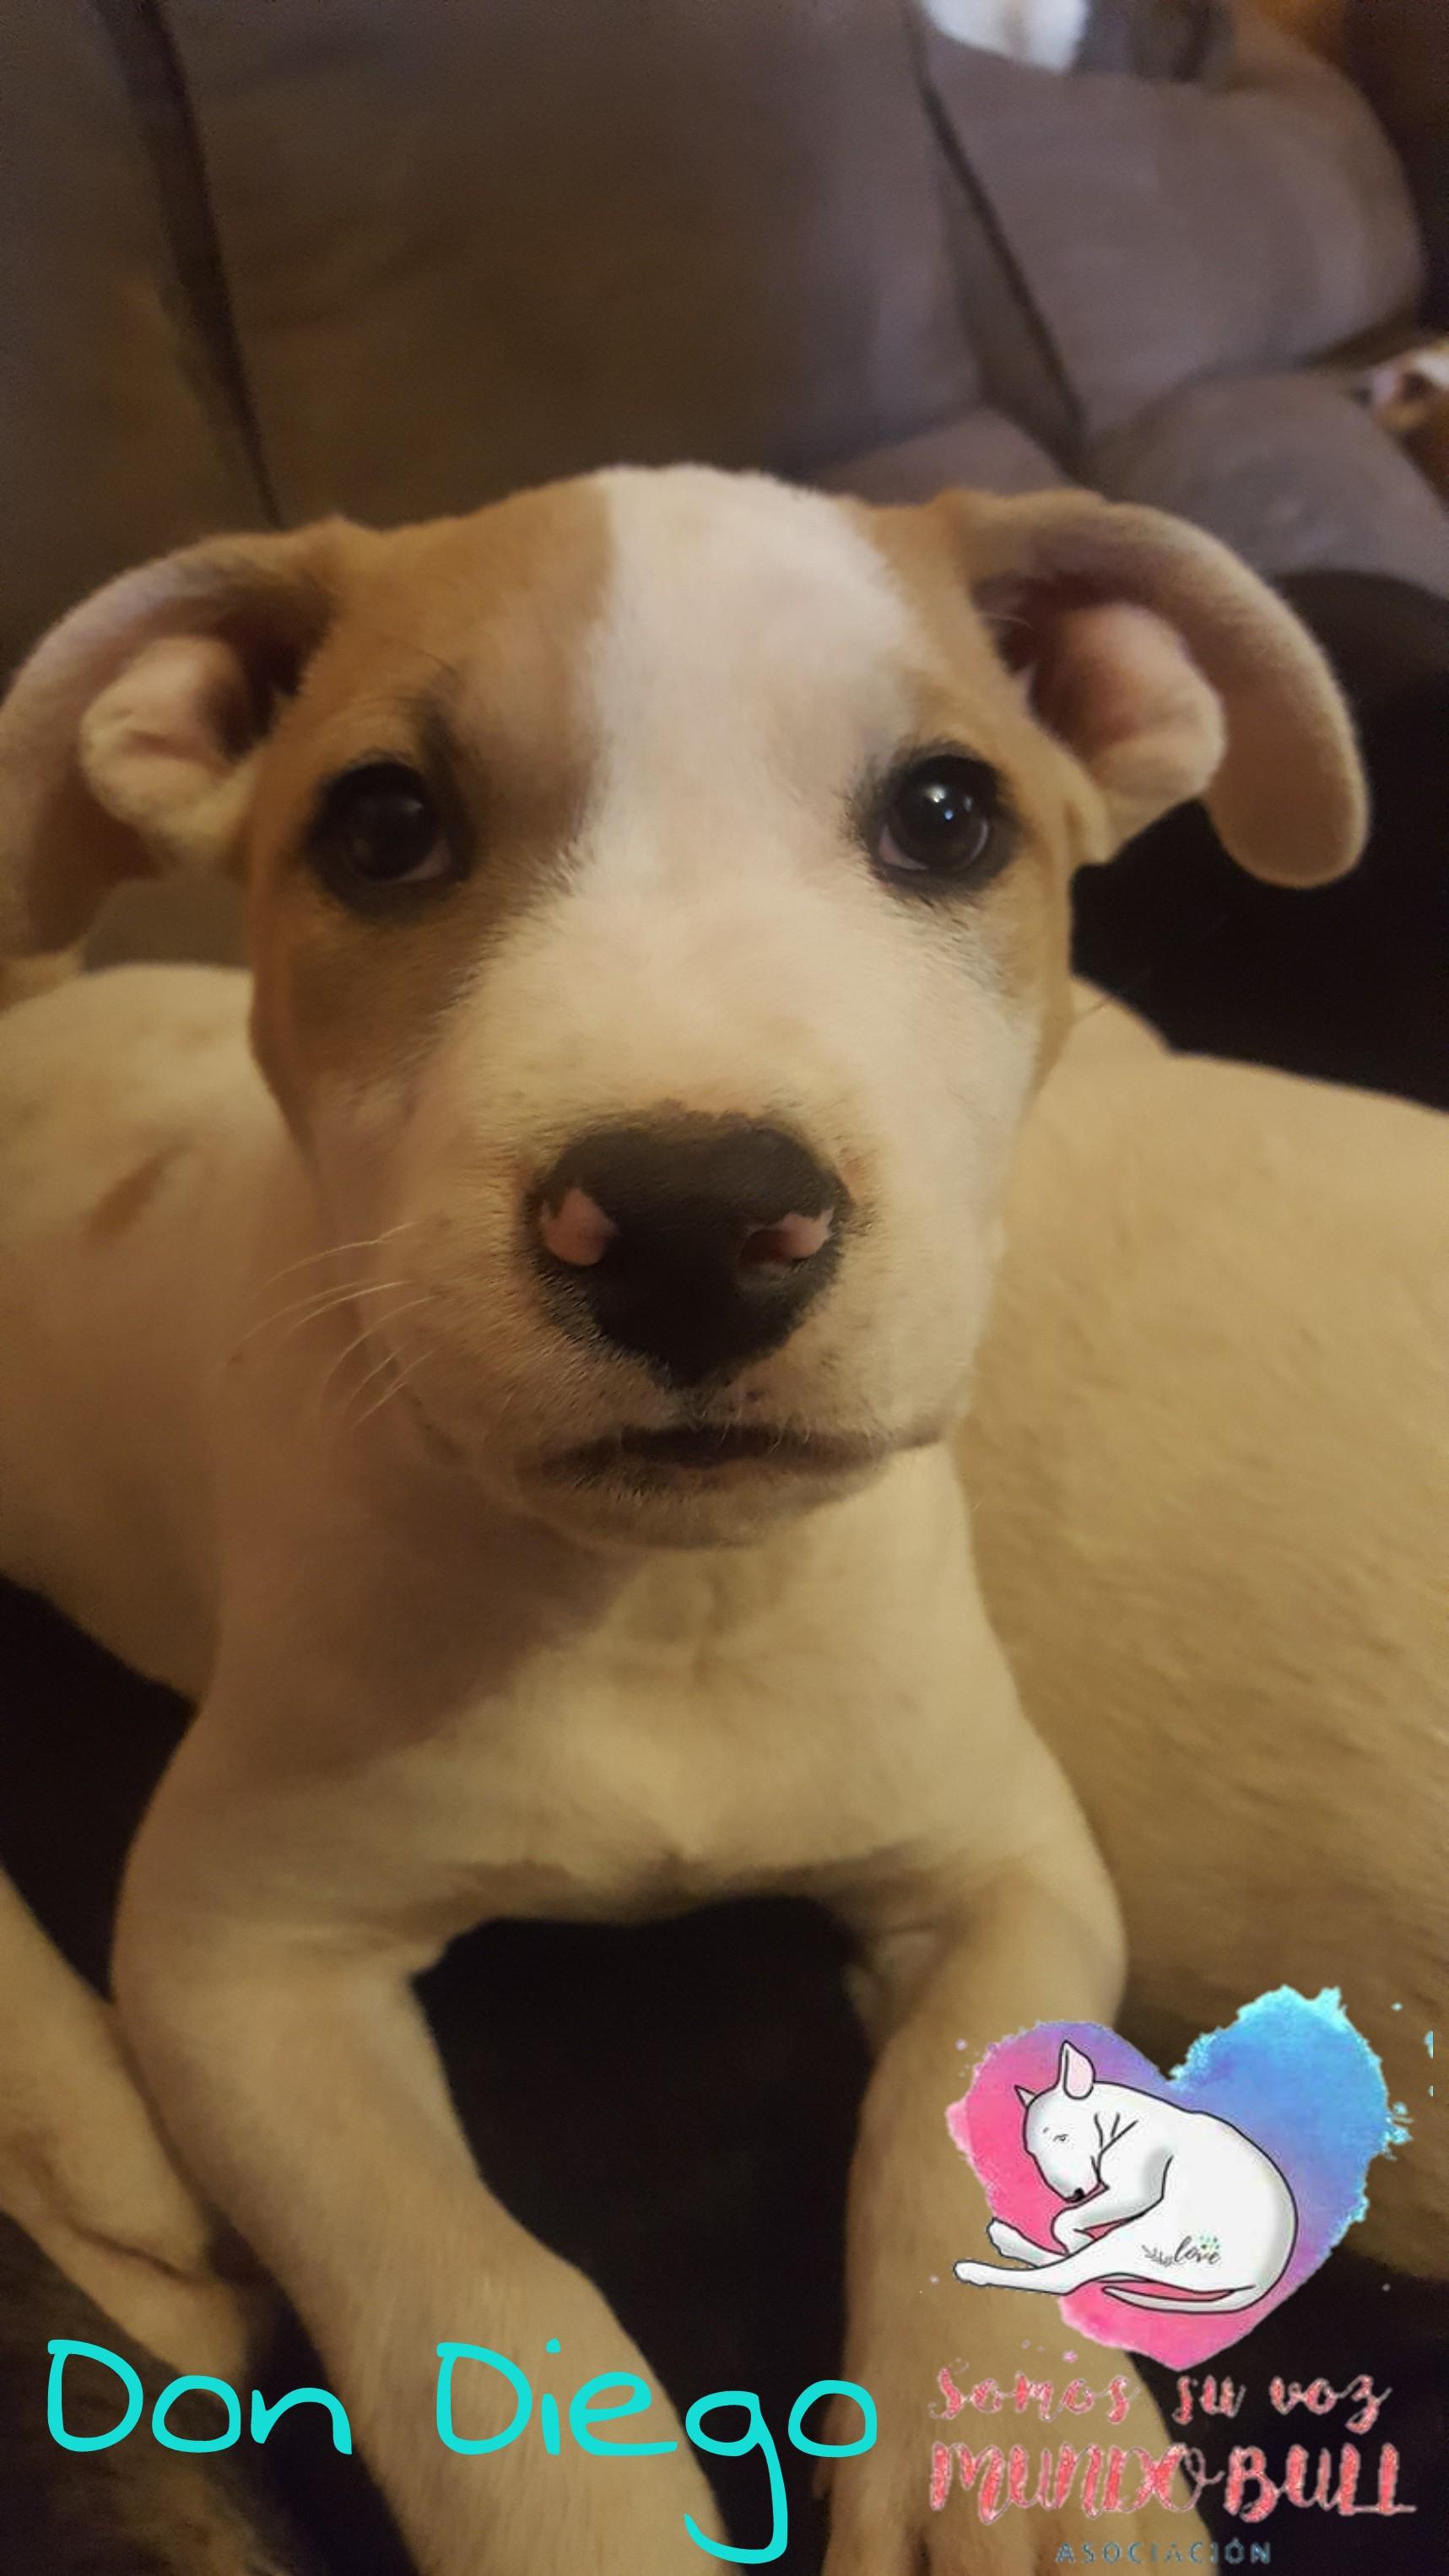 Cachorro Staffordshire bull terrier en adopción Don Diego